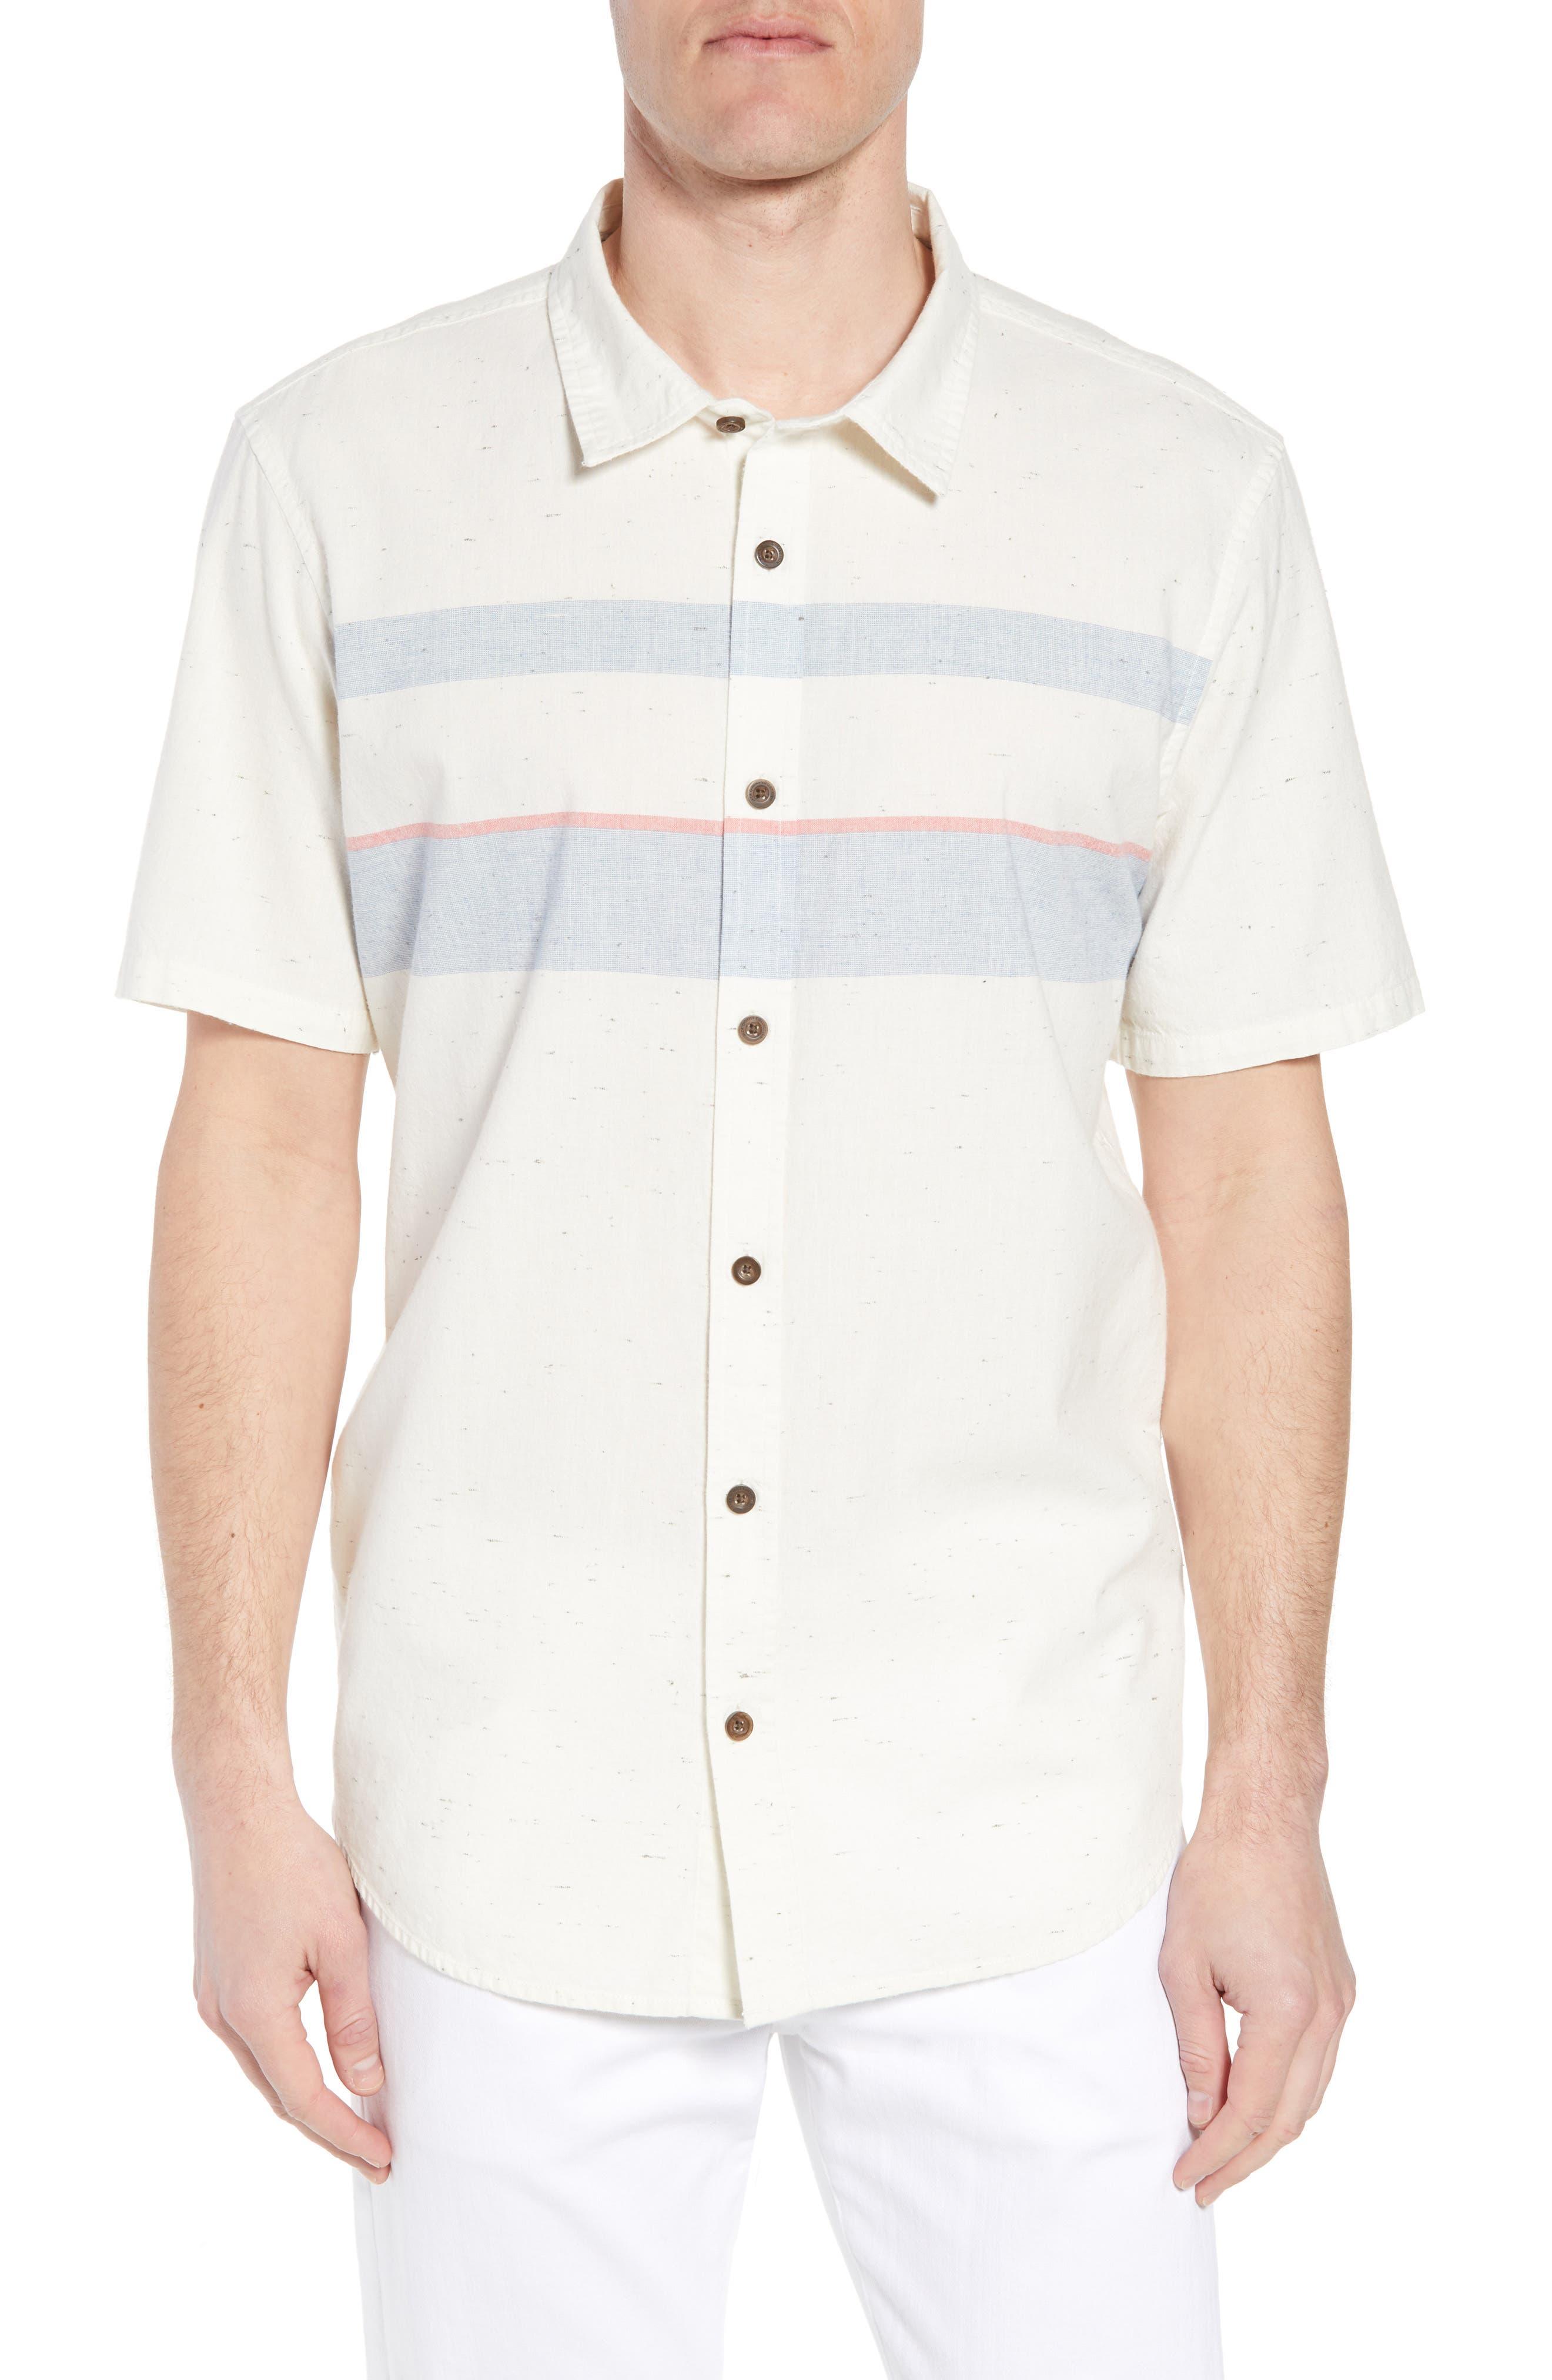 Charter Regular Fit Short Sleeve Sport Shirt,                             Main thumbnail 1, color,                             WHITE